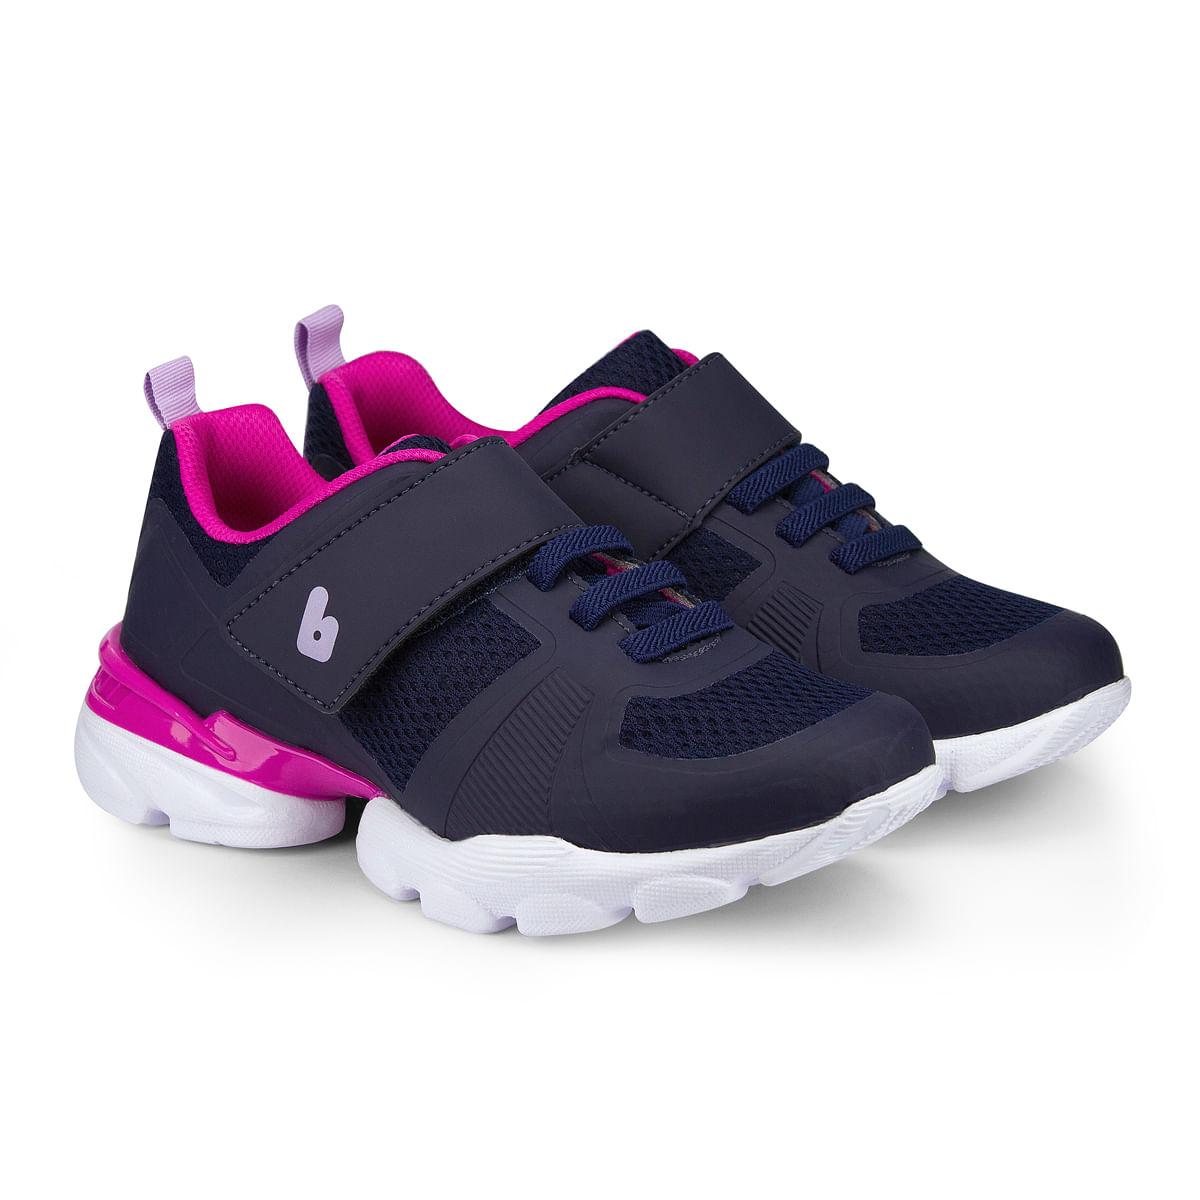 9ba430123a5 Tênis Infantil Bibi Feminino Rosa Drop New 983132 - Bibi Calçados